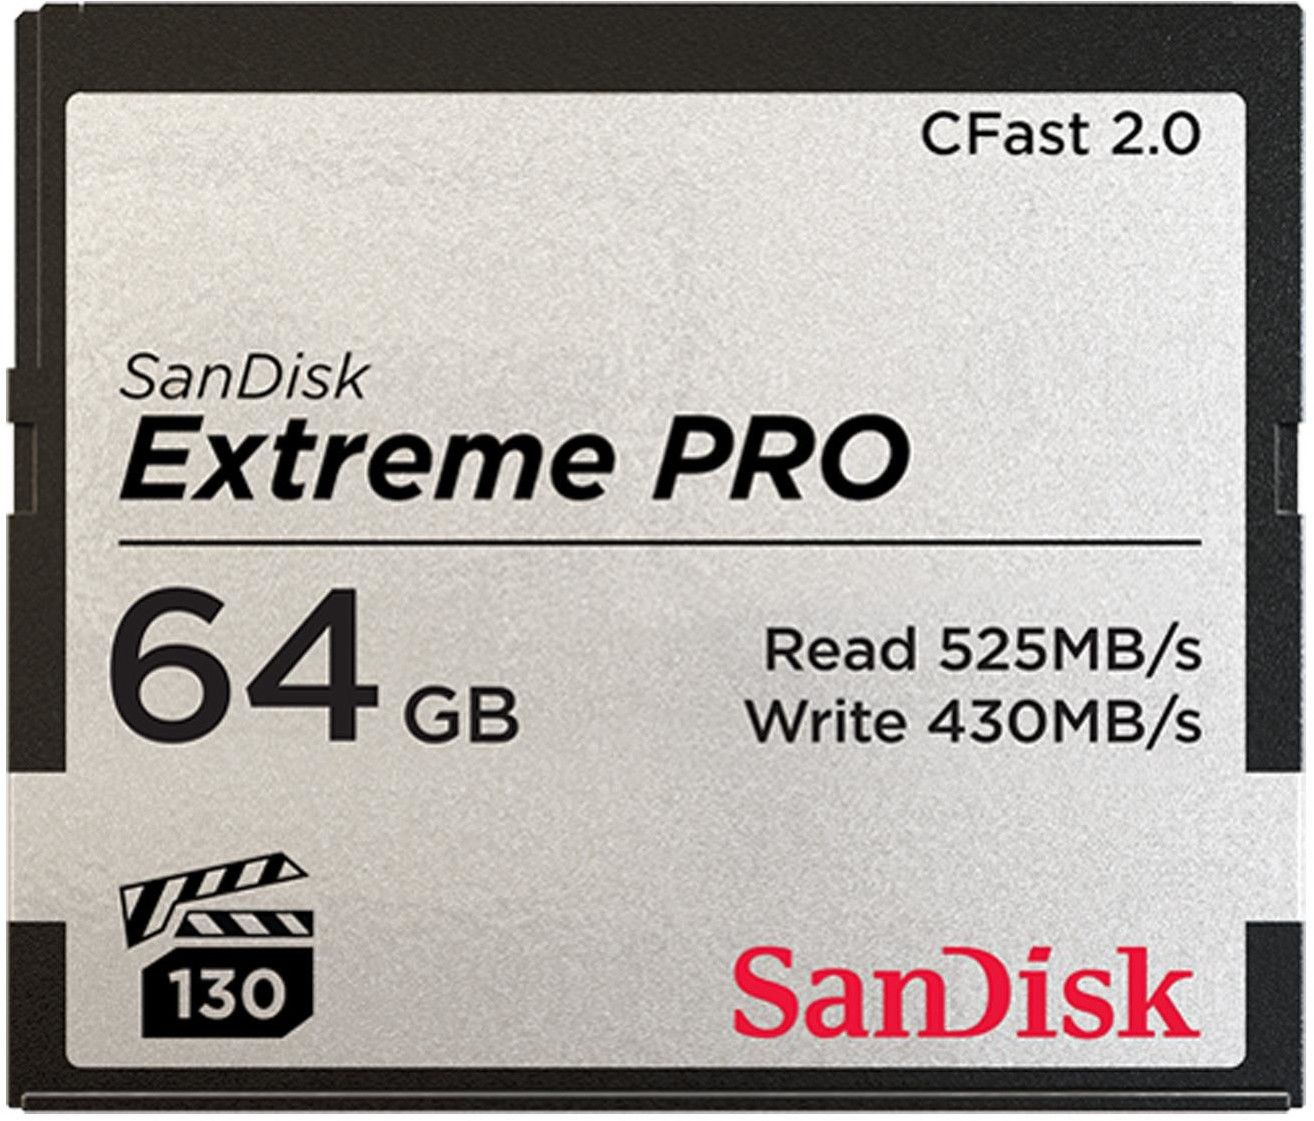 Karta pamięci CFast 2.0 - 64 GB 525MB/s SanDisk Extreme PRO (1)